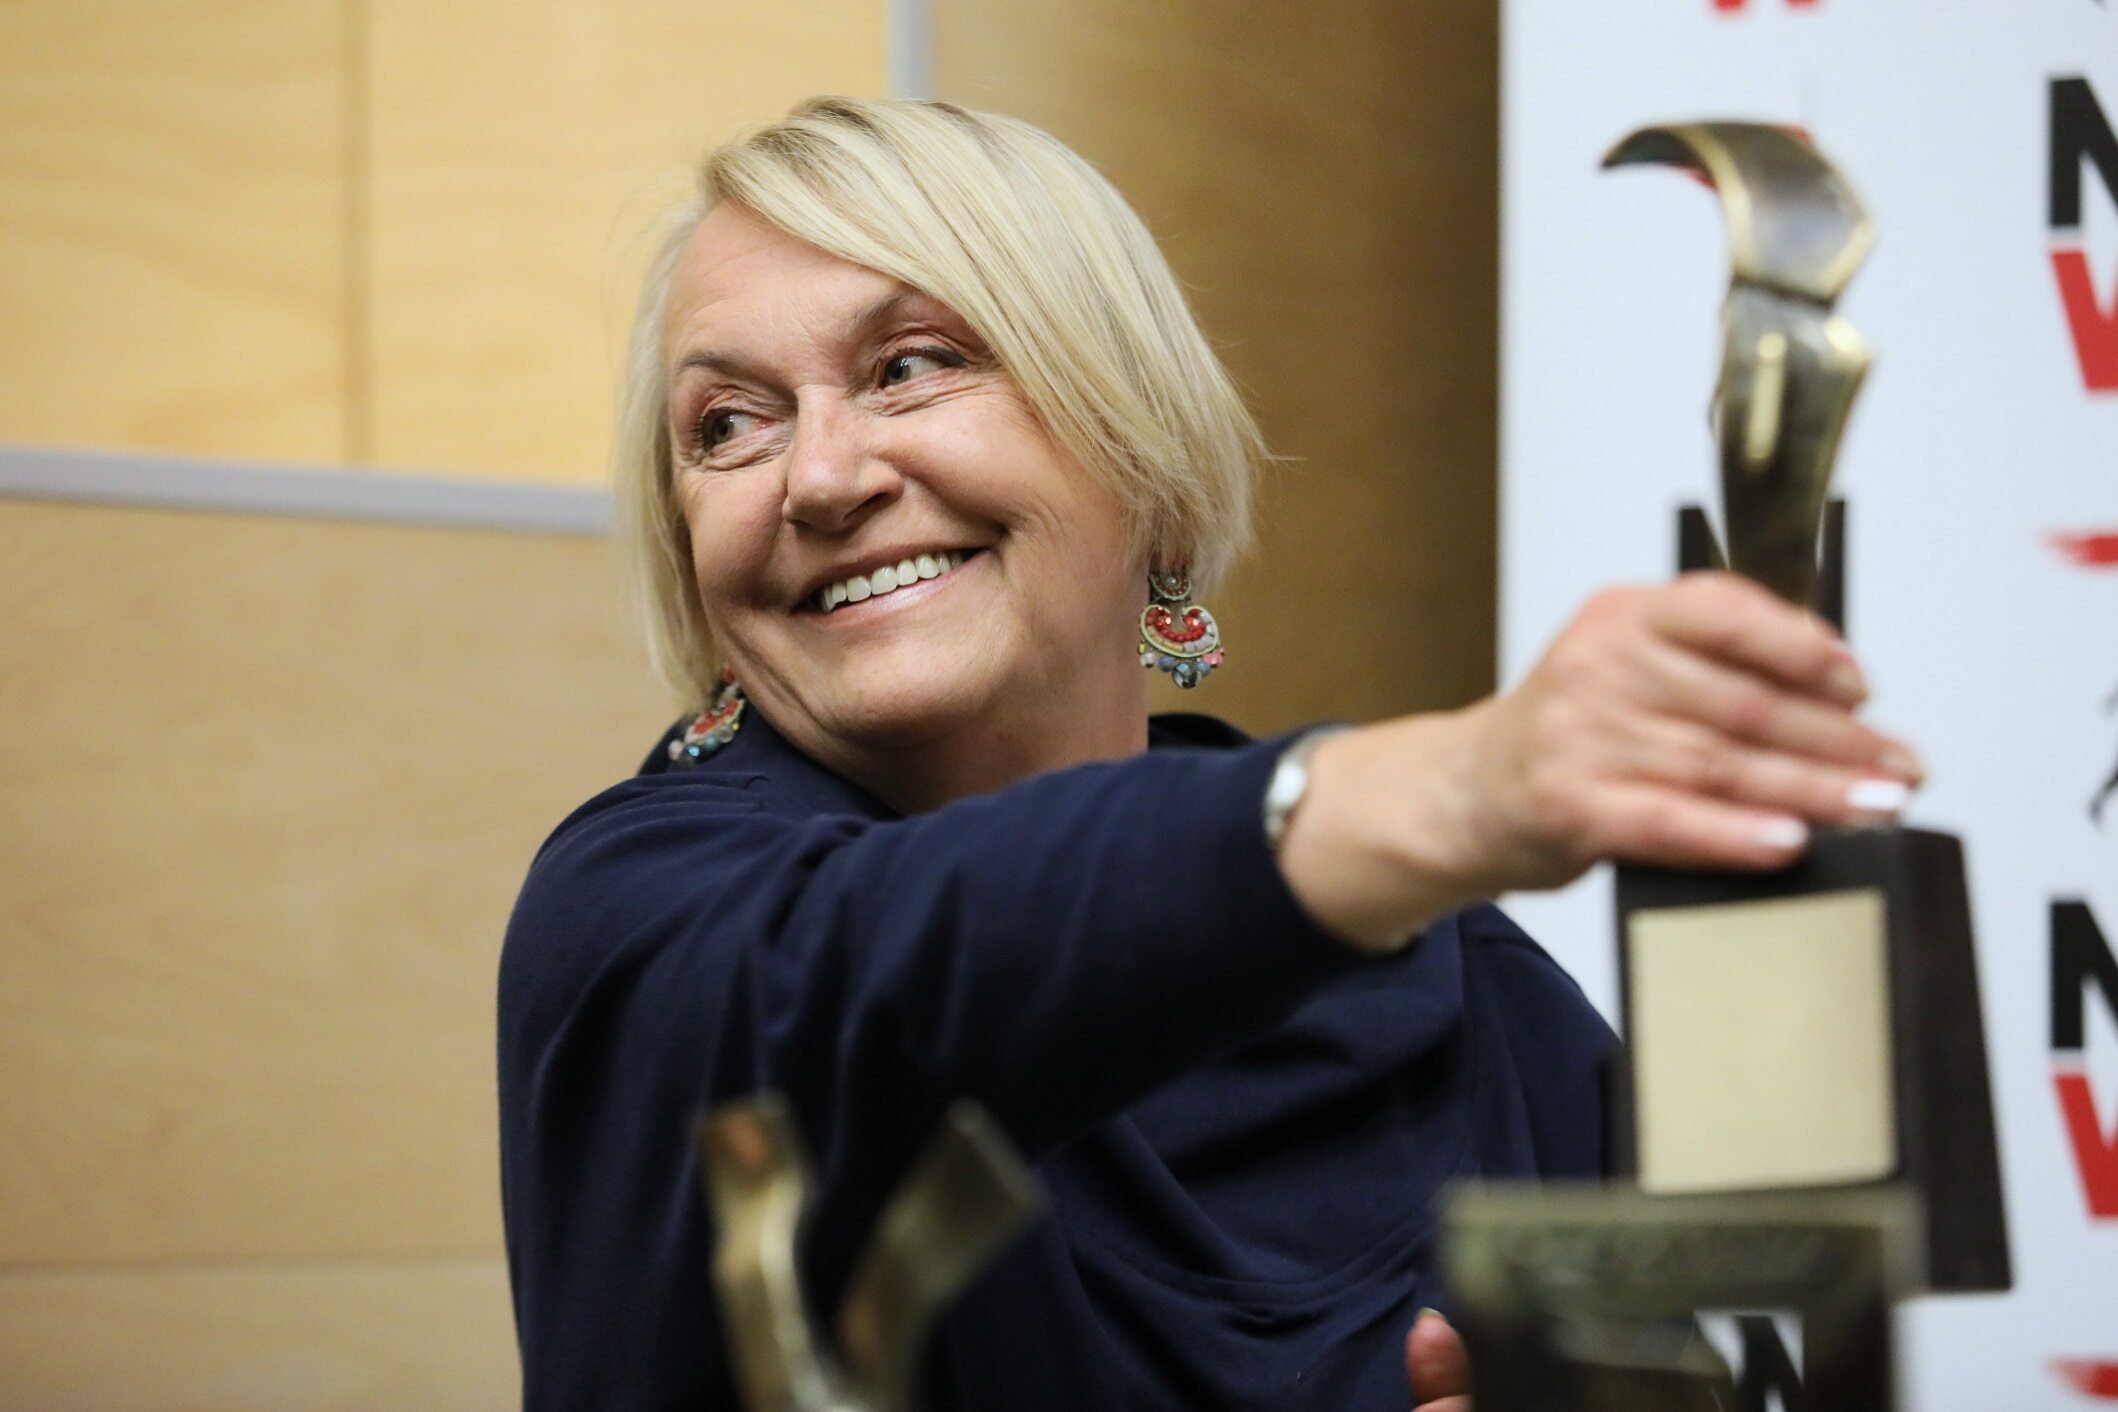 Maria Dłużewska